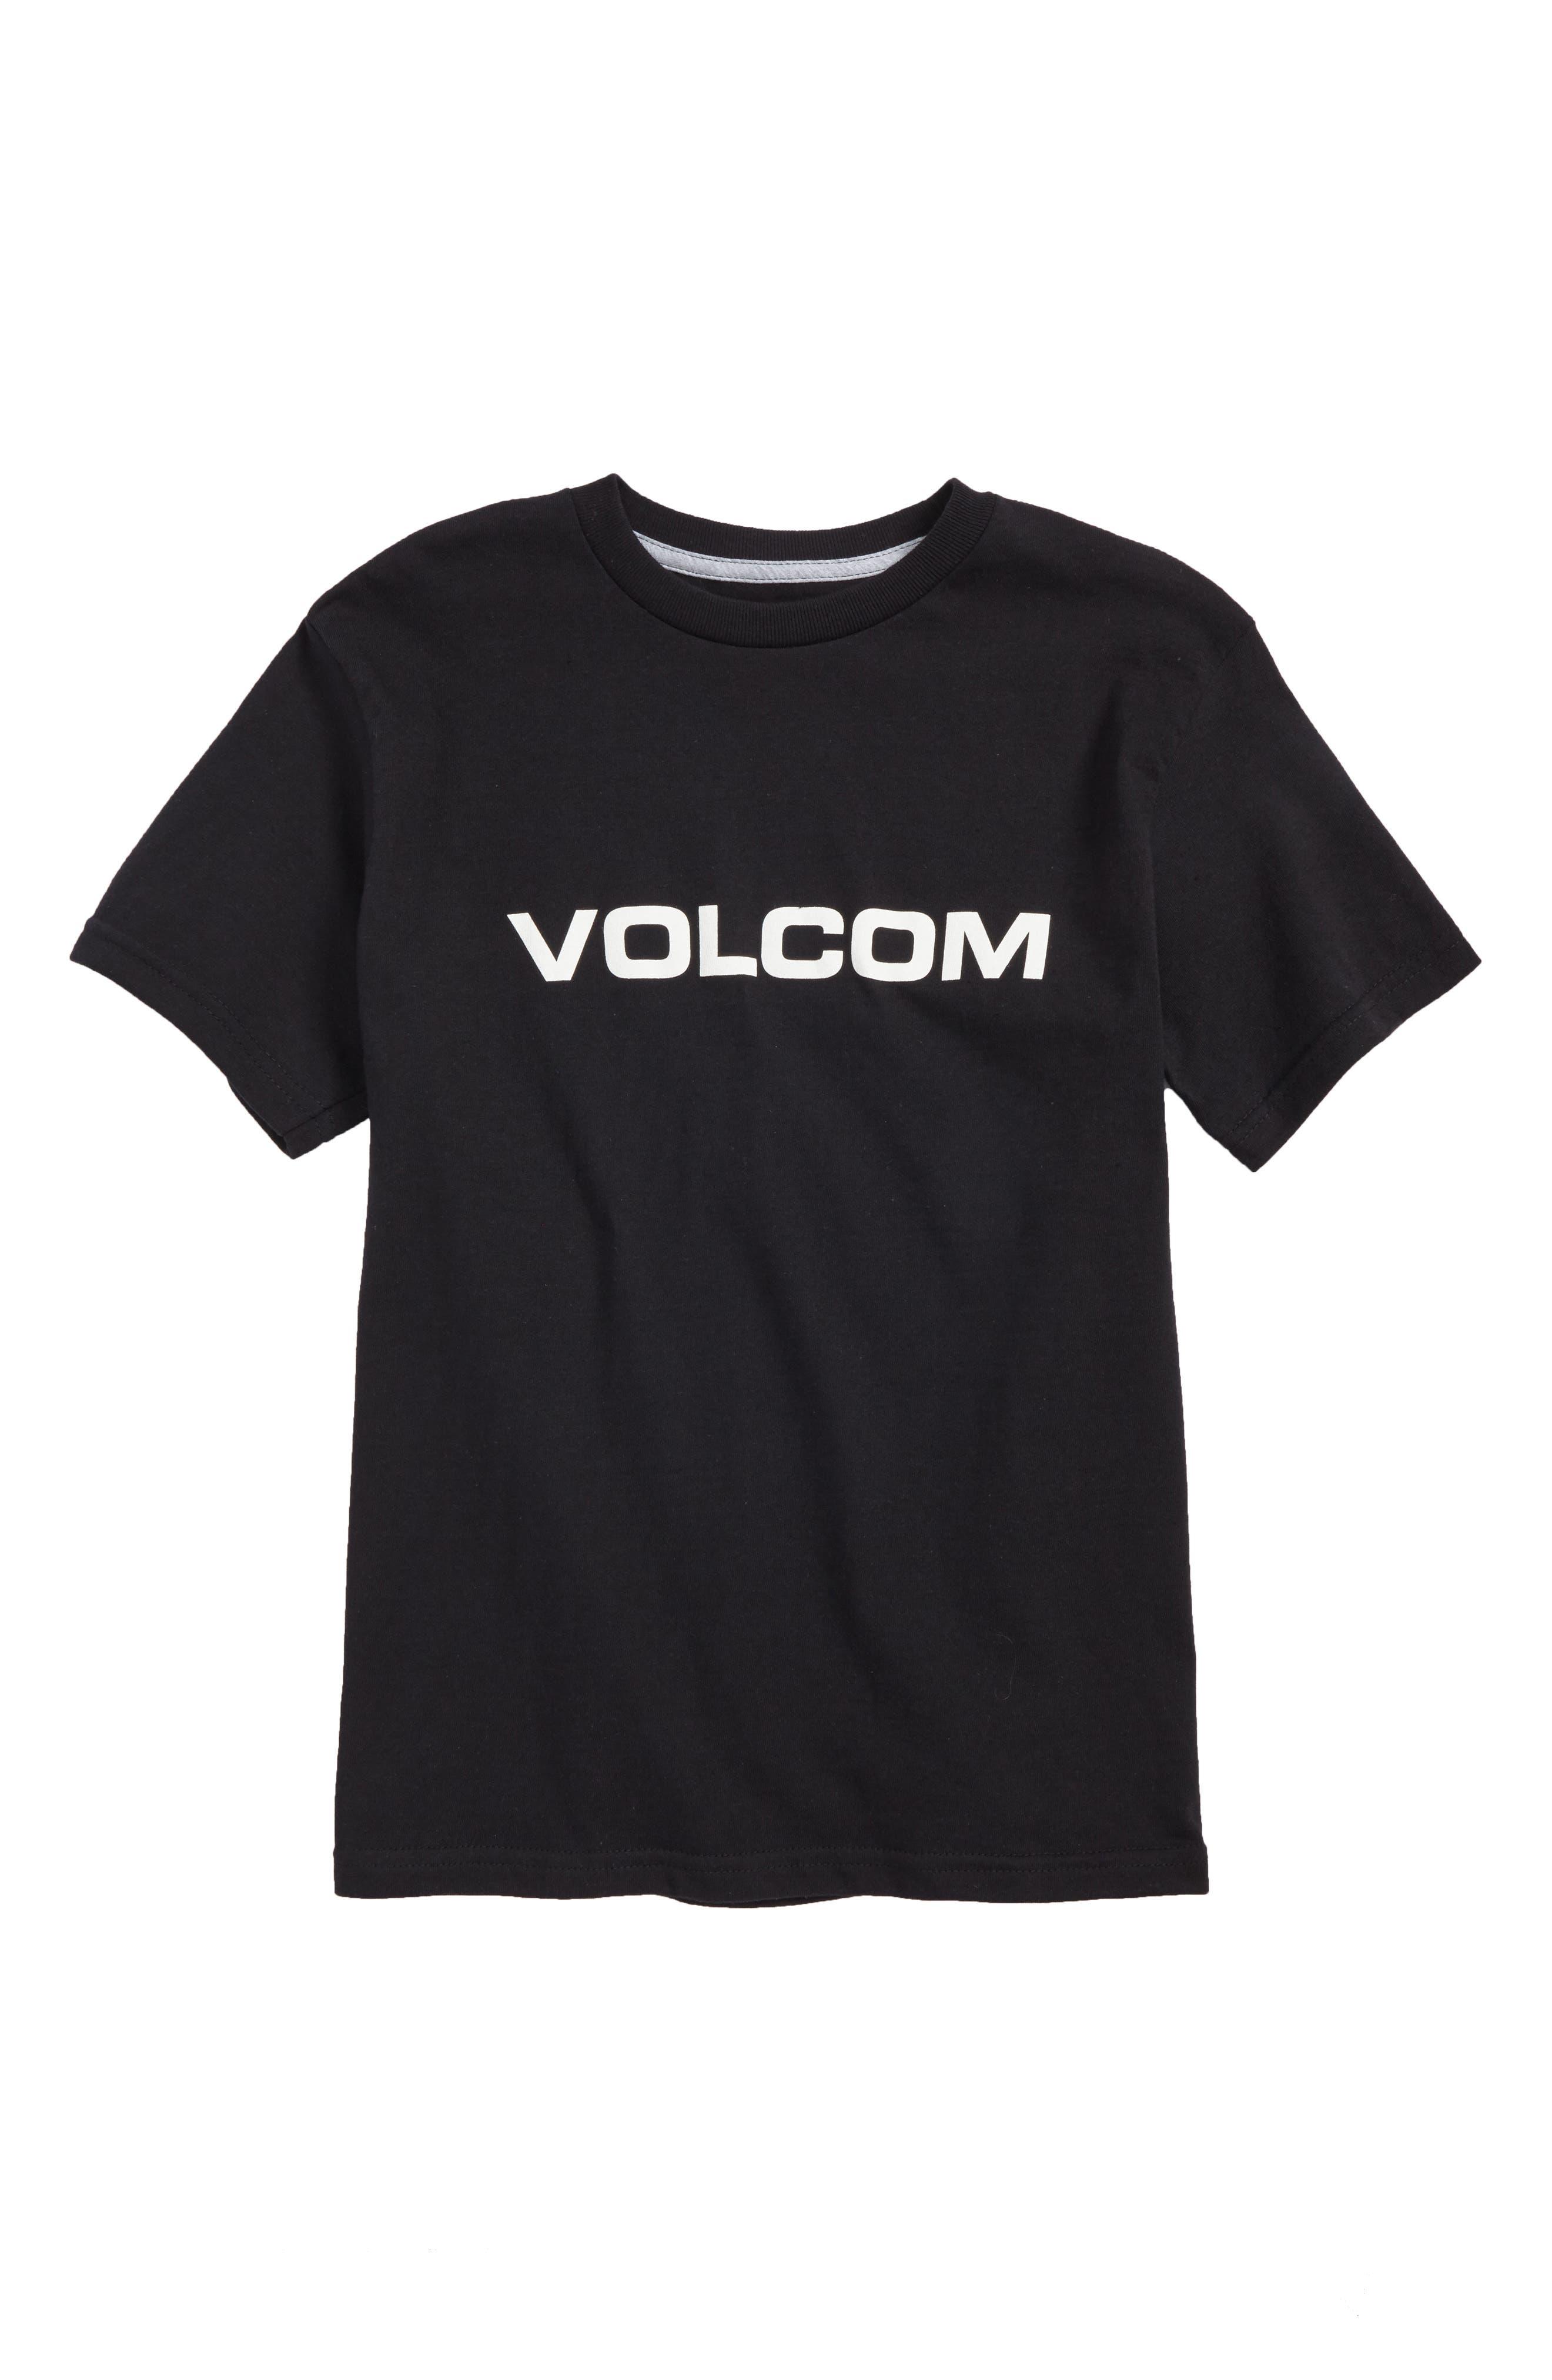 Alternate Image 1 Selected - Volcom Crisp Euro T-Shirt (Big Boys)